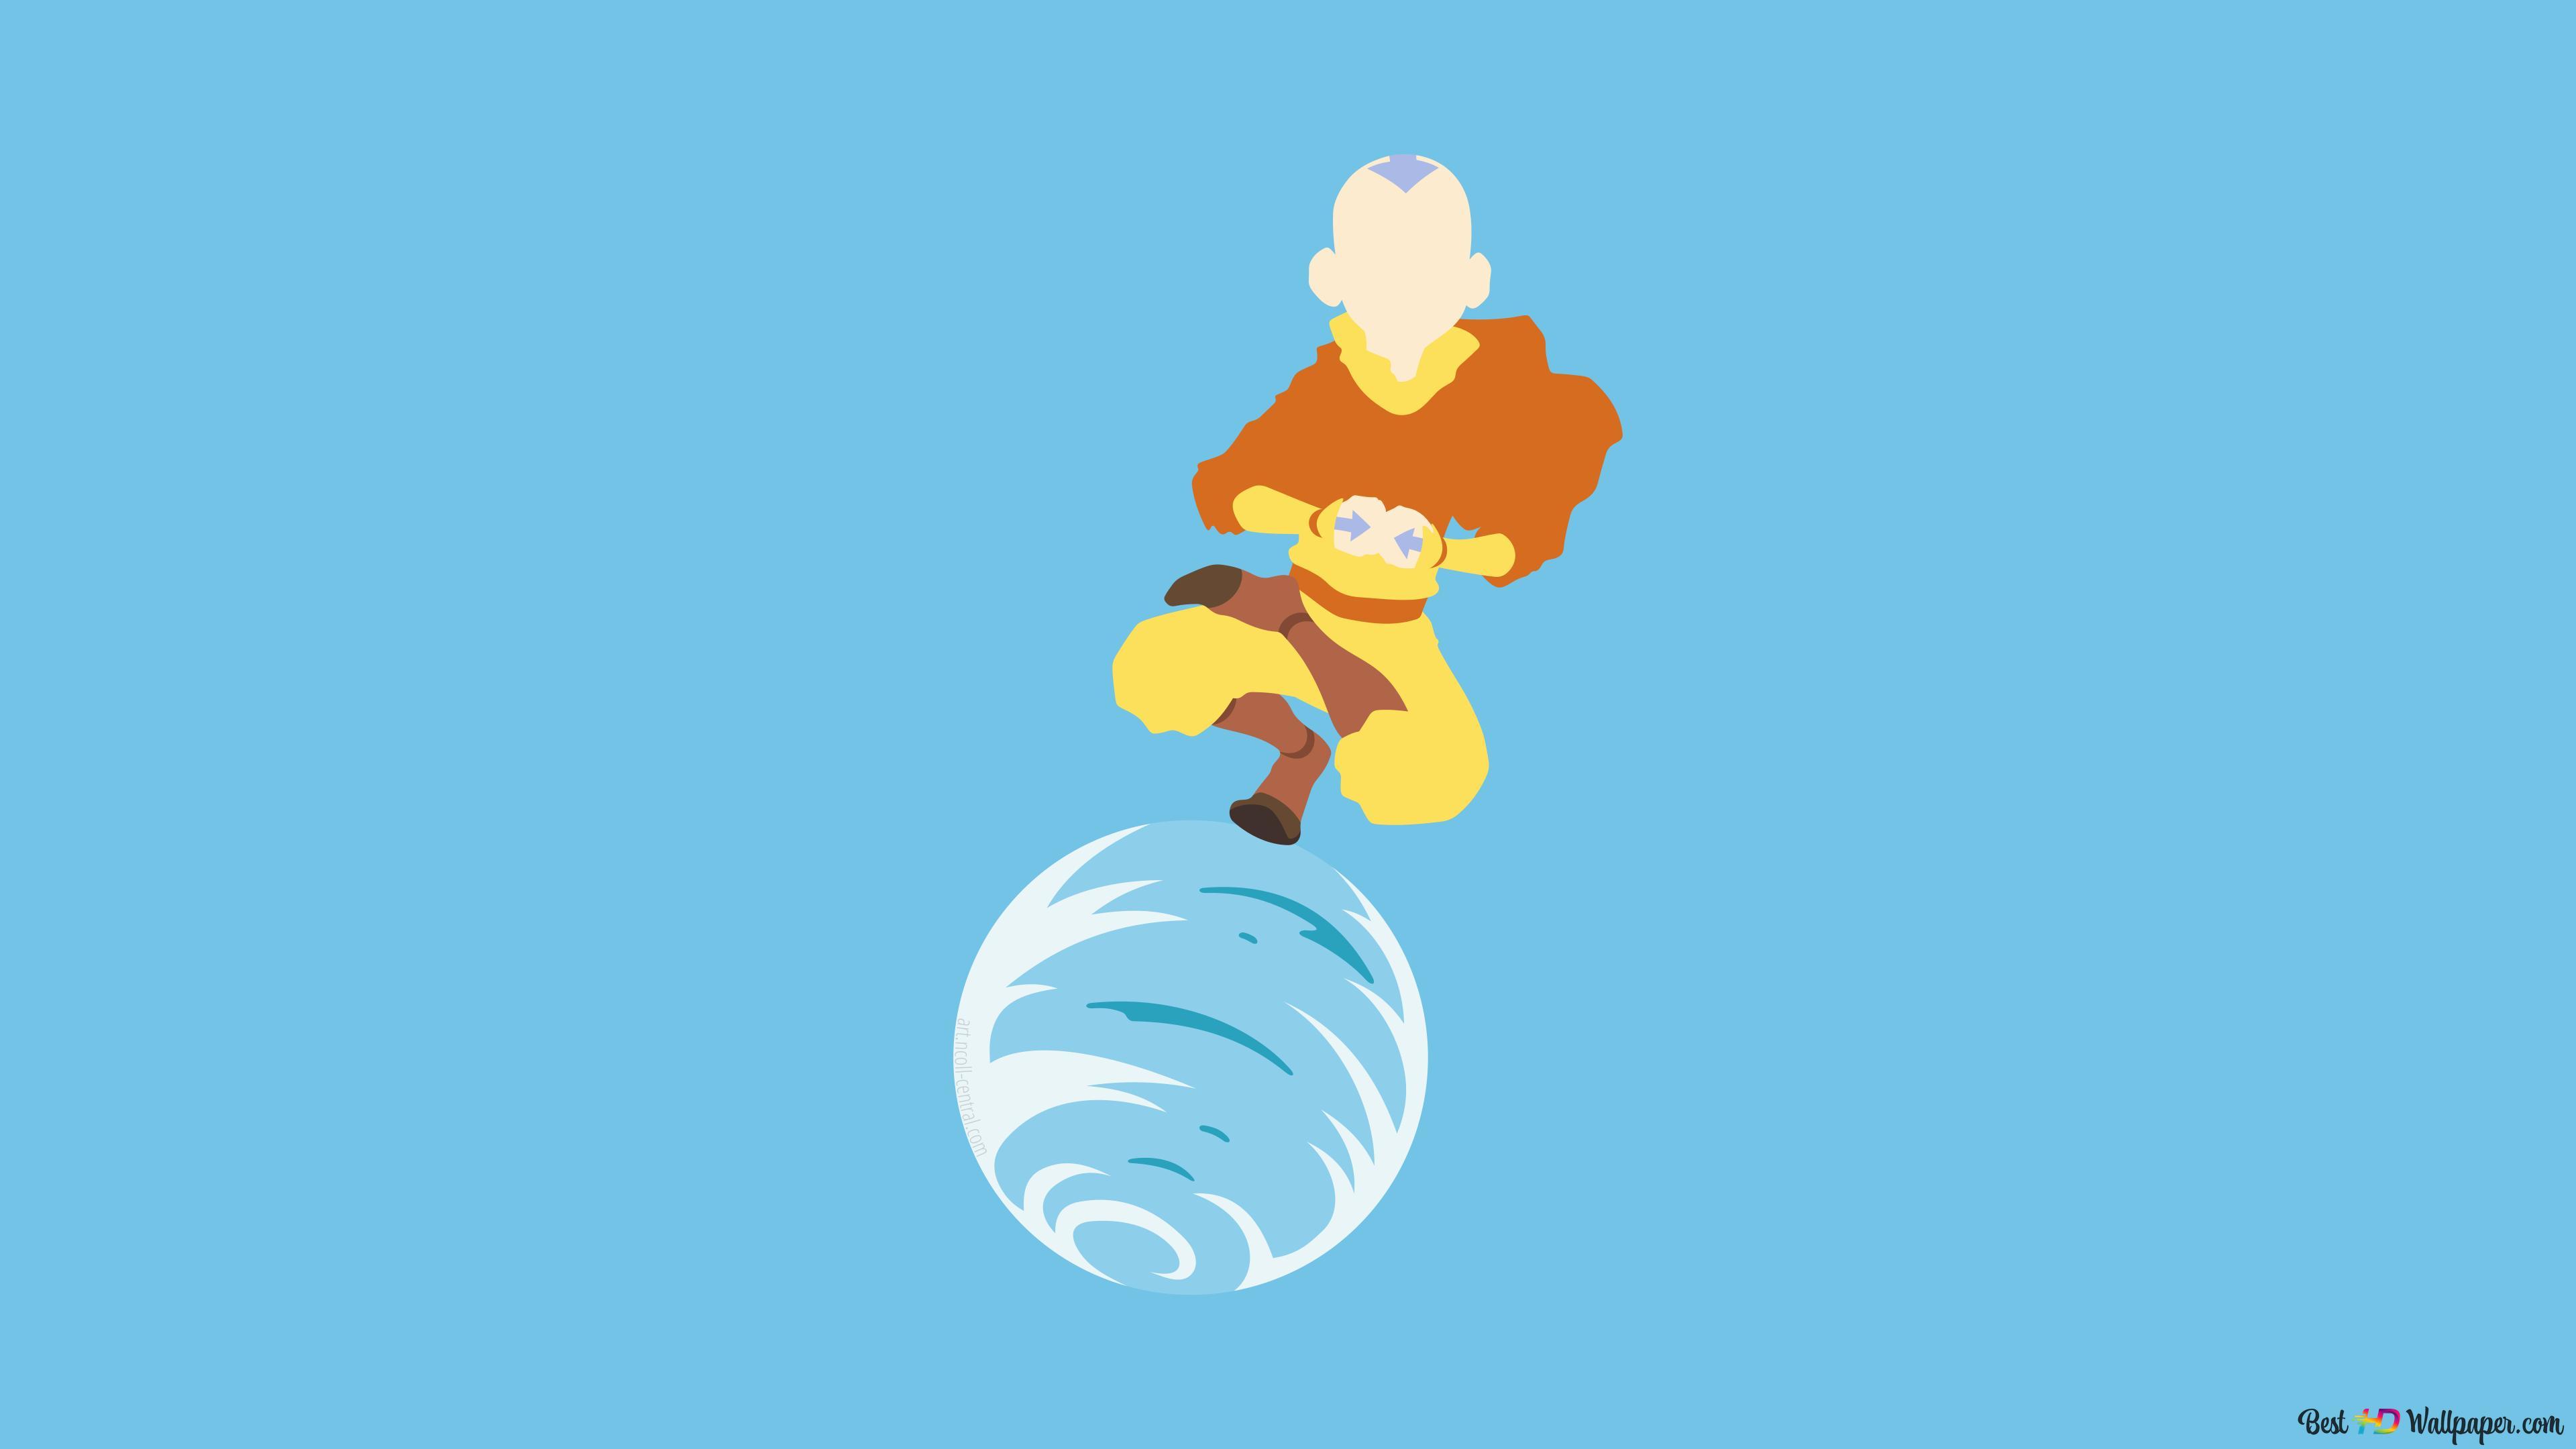 Aang Of Avatar The Last Airbender Hd Wallpaper Download